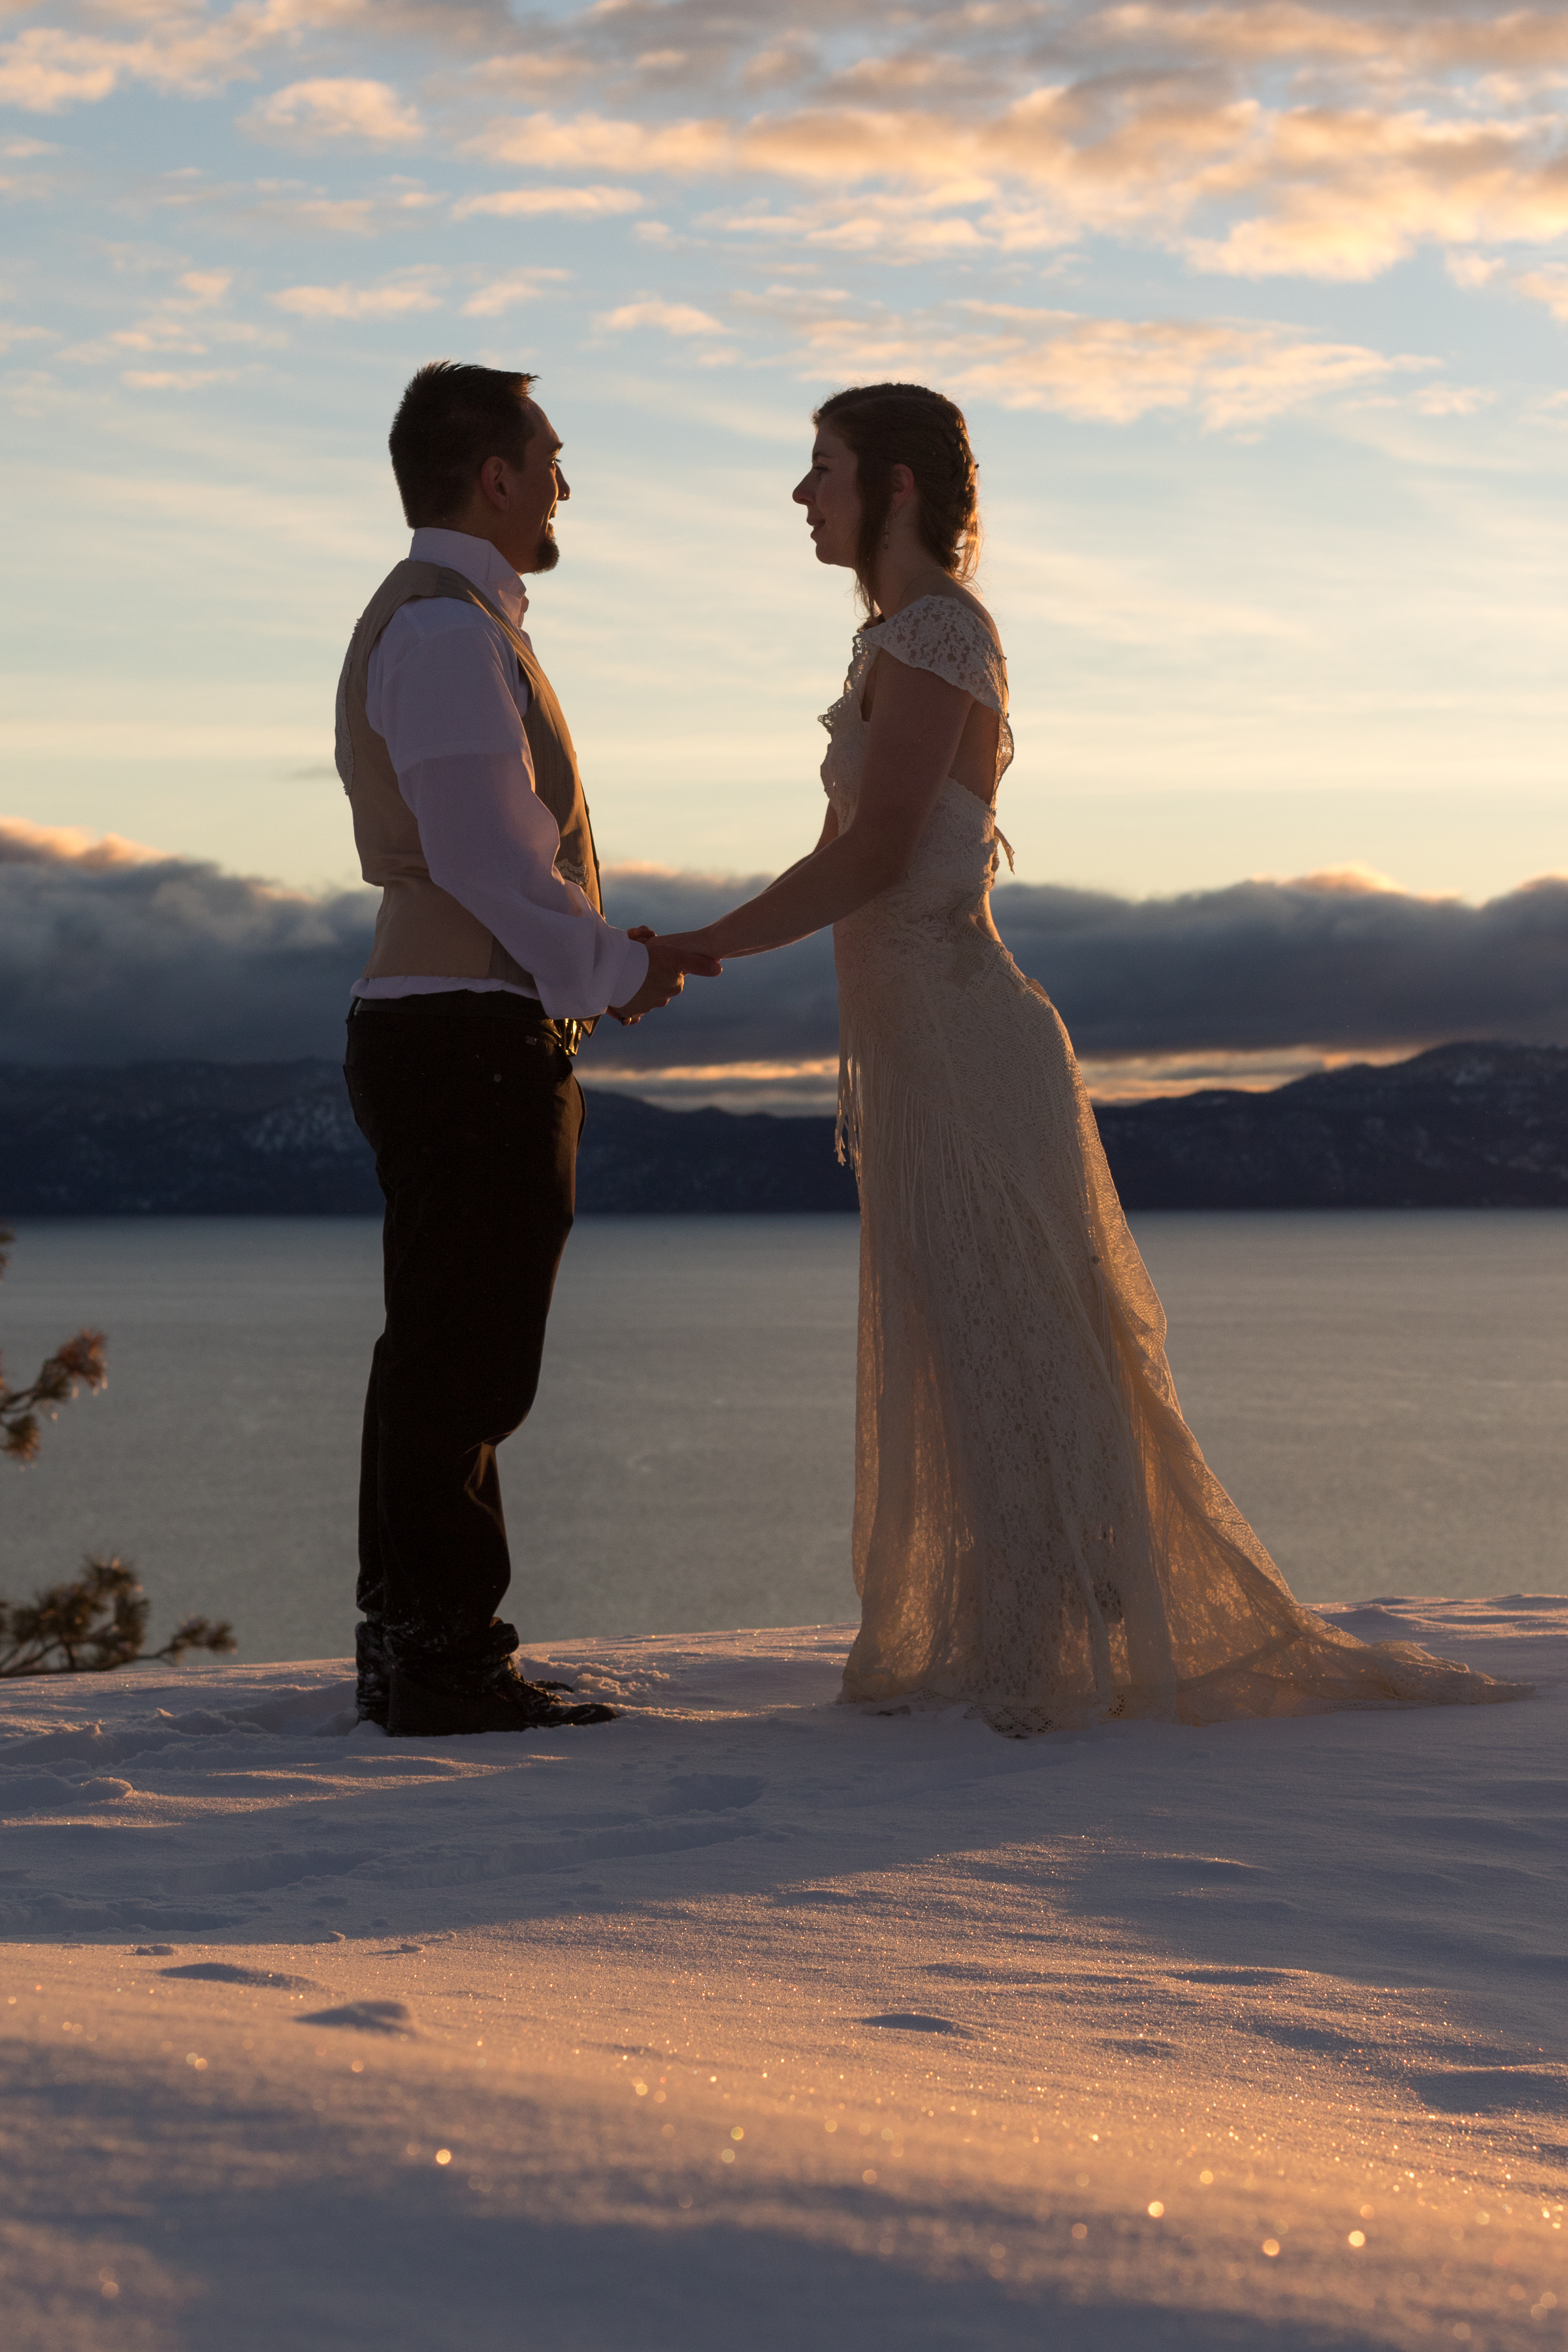 Wedding-EagelRock-KiethRutherford-35.jpg